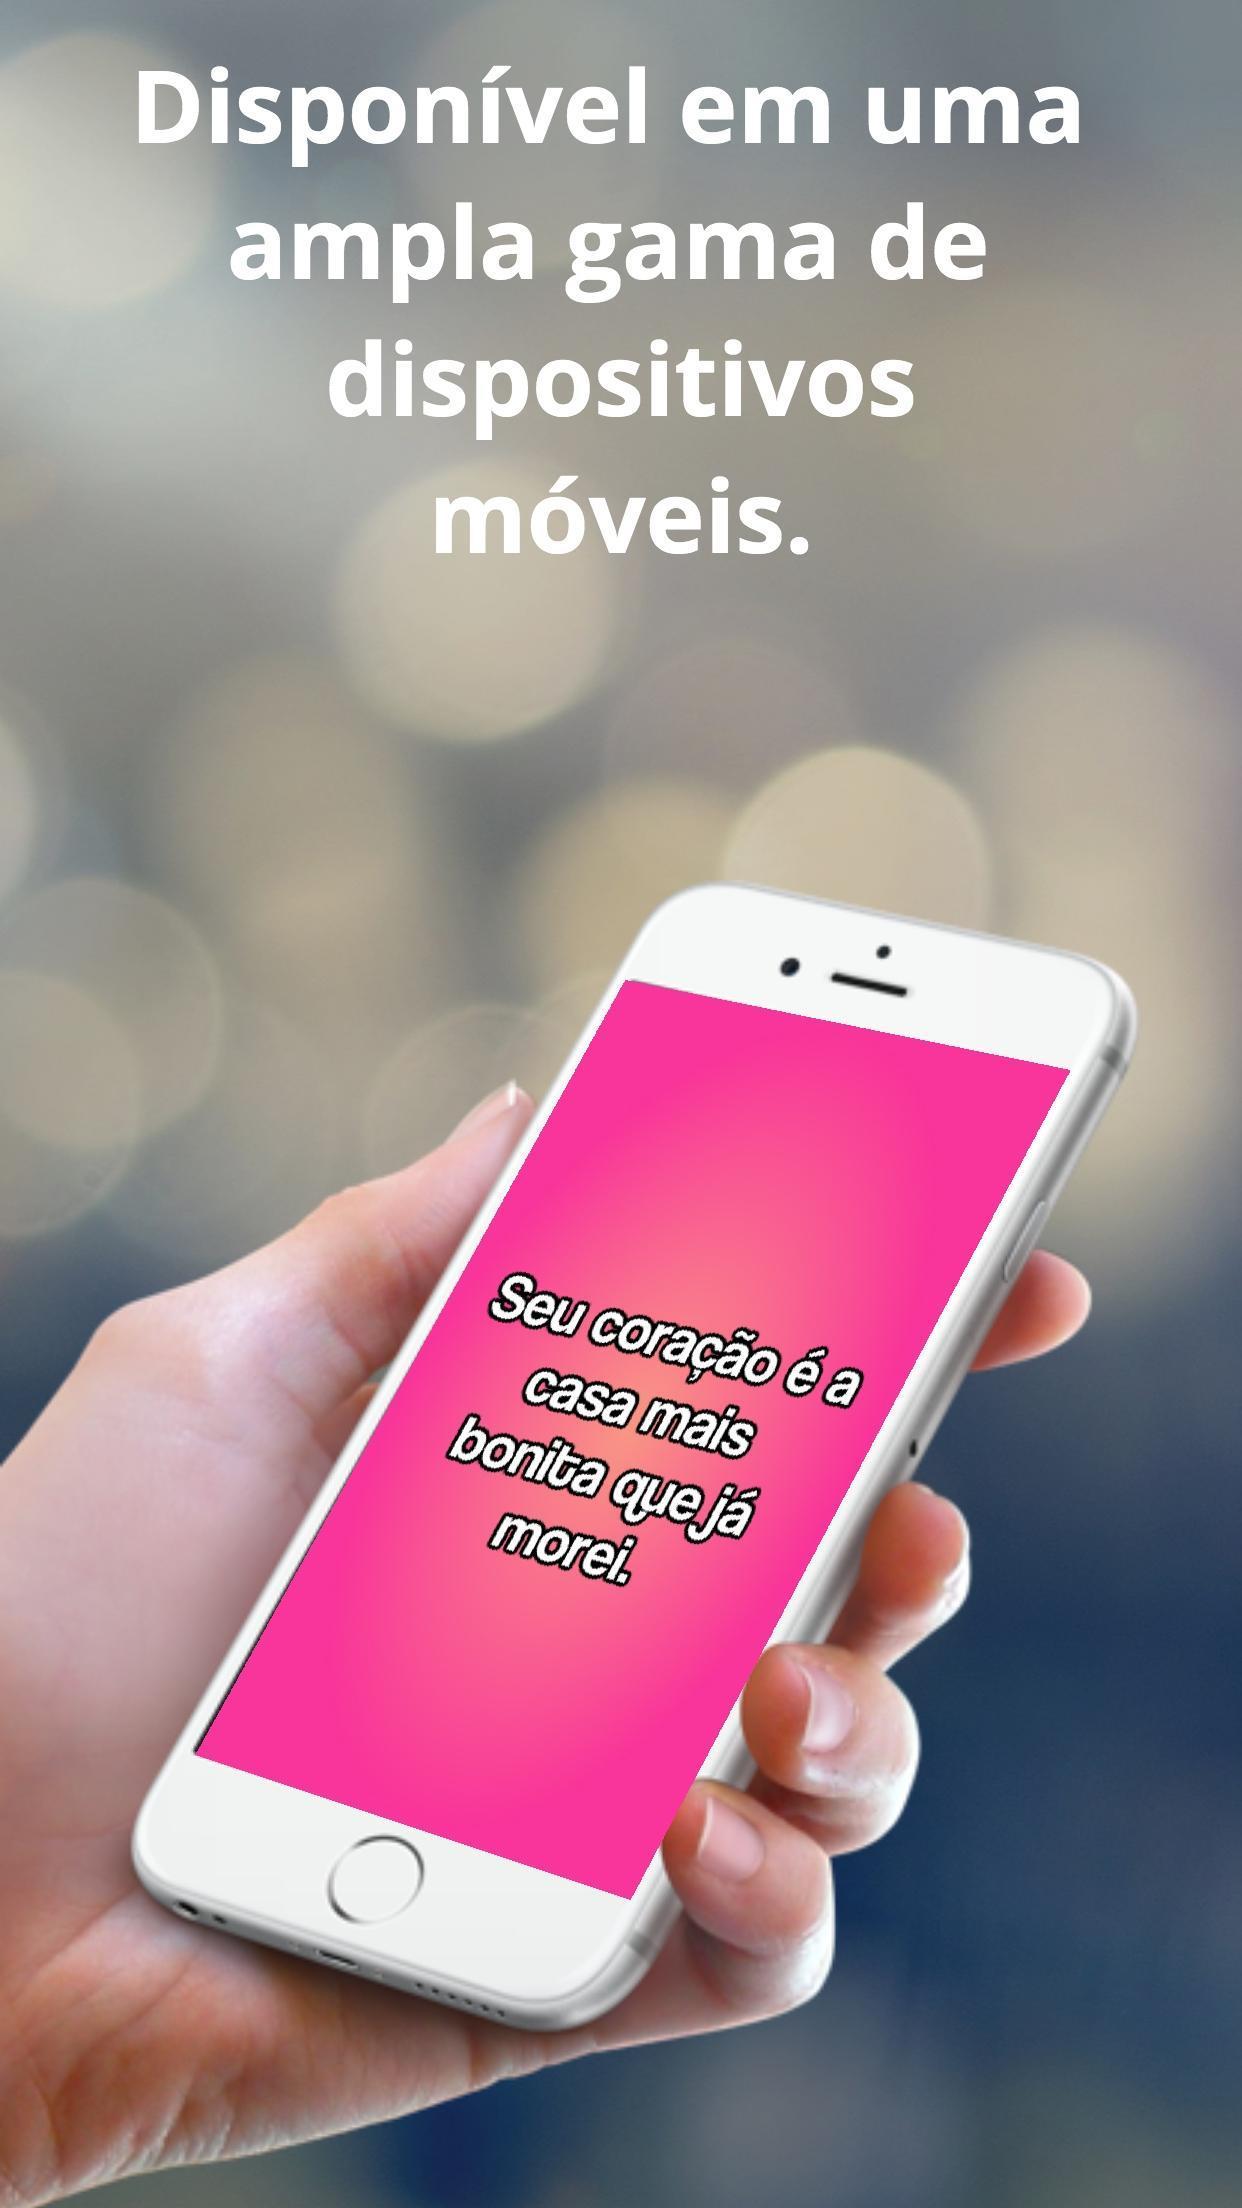 Frases Para Fotos De Amor For Android Apk Download